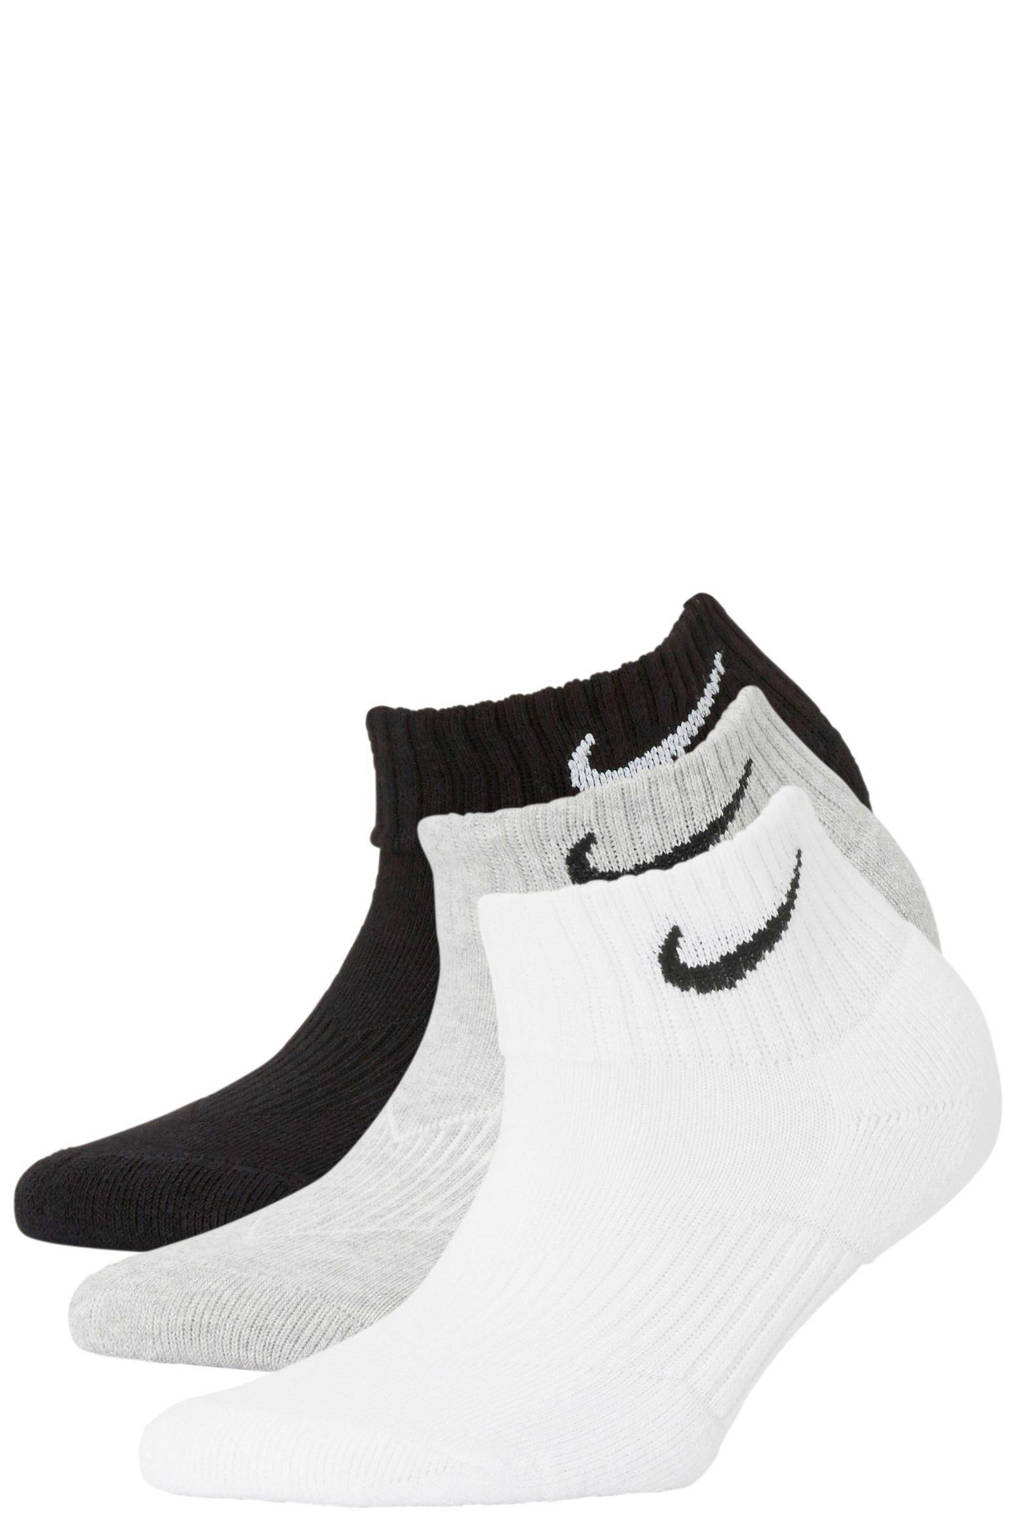 Nike   sportsokken (set van 3), Grijs/wit/zwart